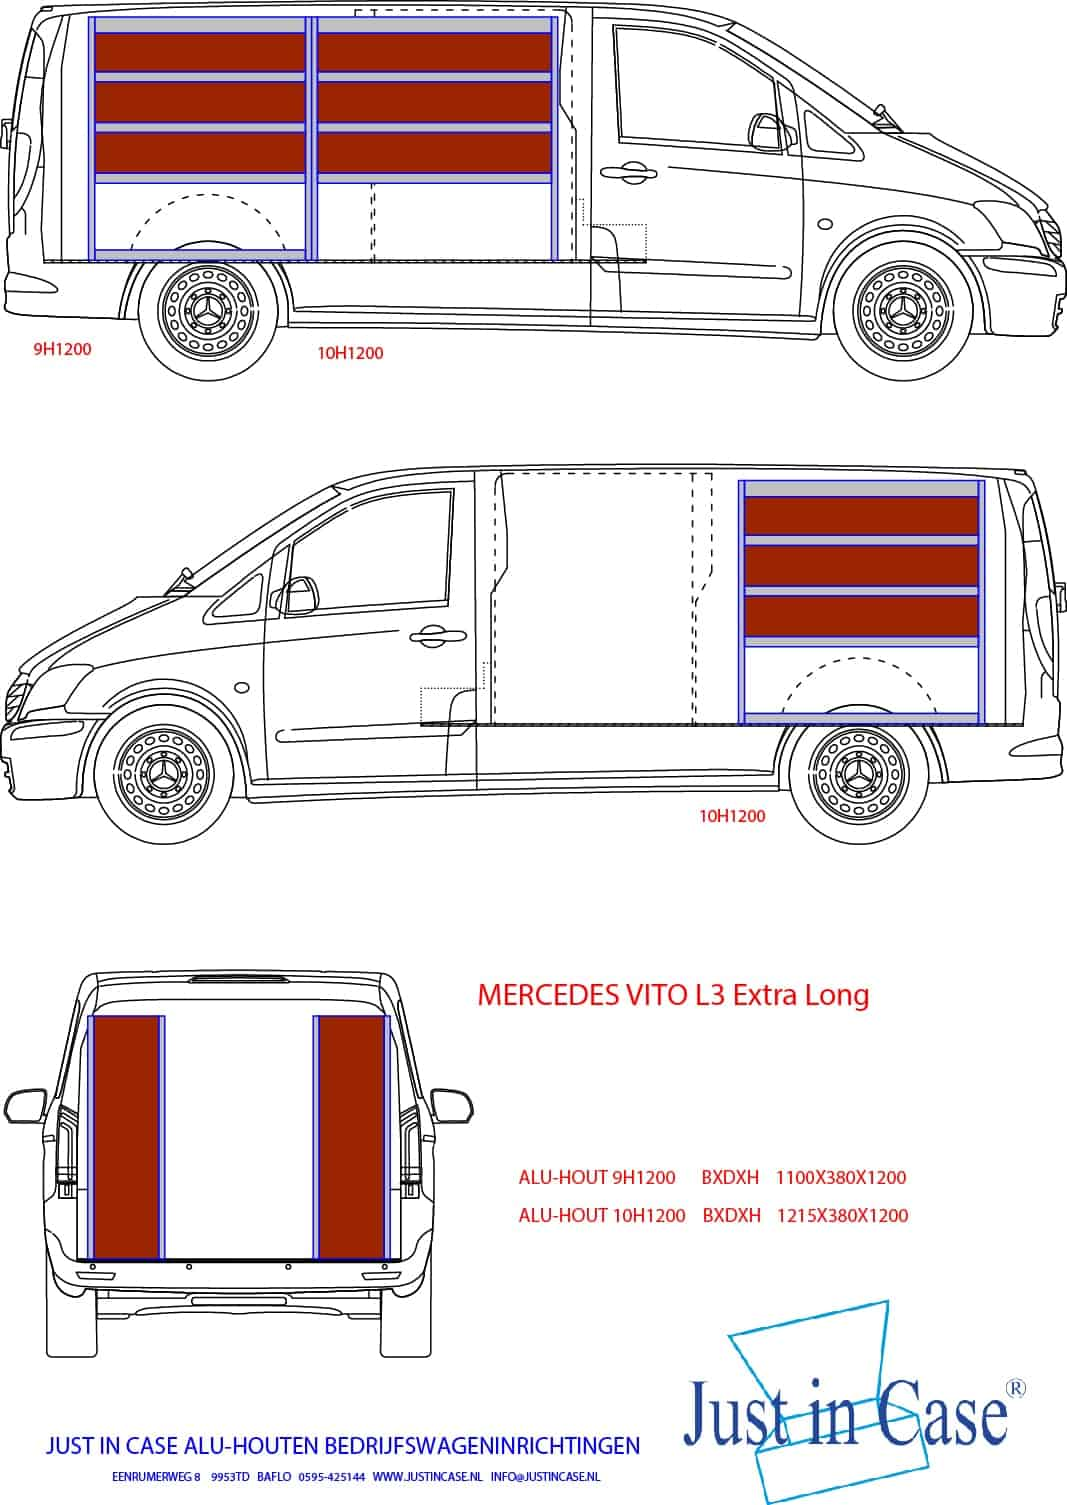 Mercedes Vito (L3) bedrijfswageninirchting